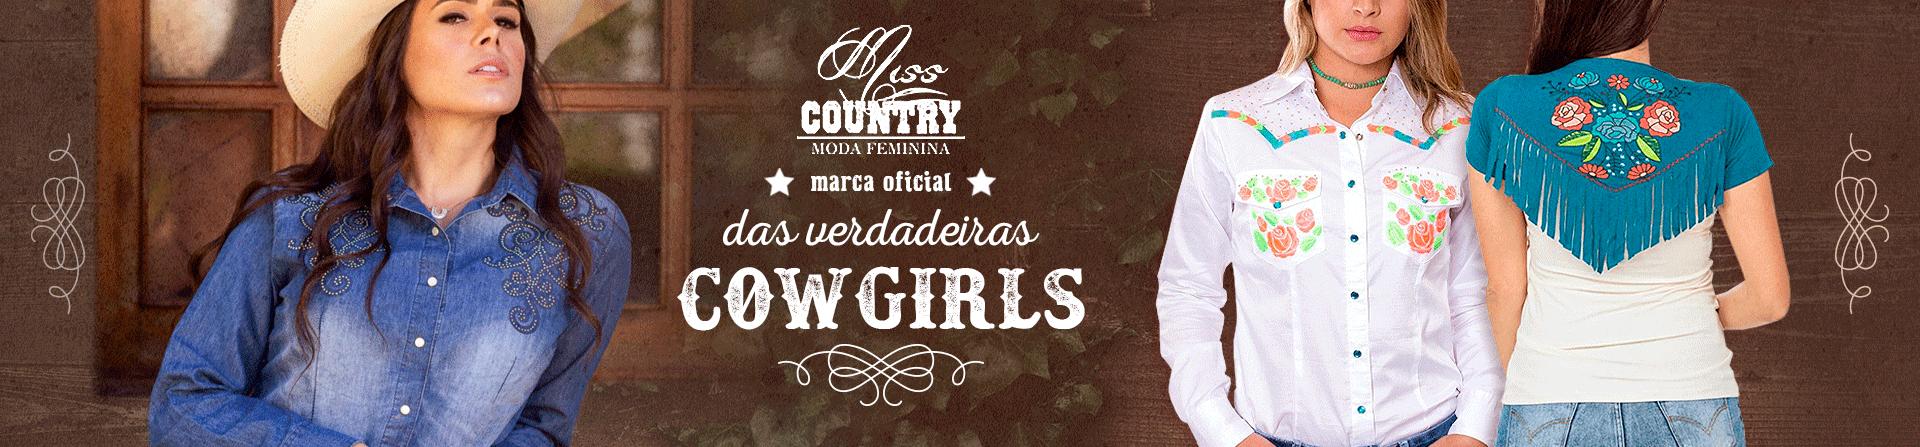 Miss country verdadeiras cowgirls